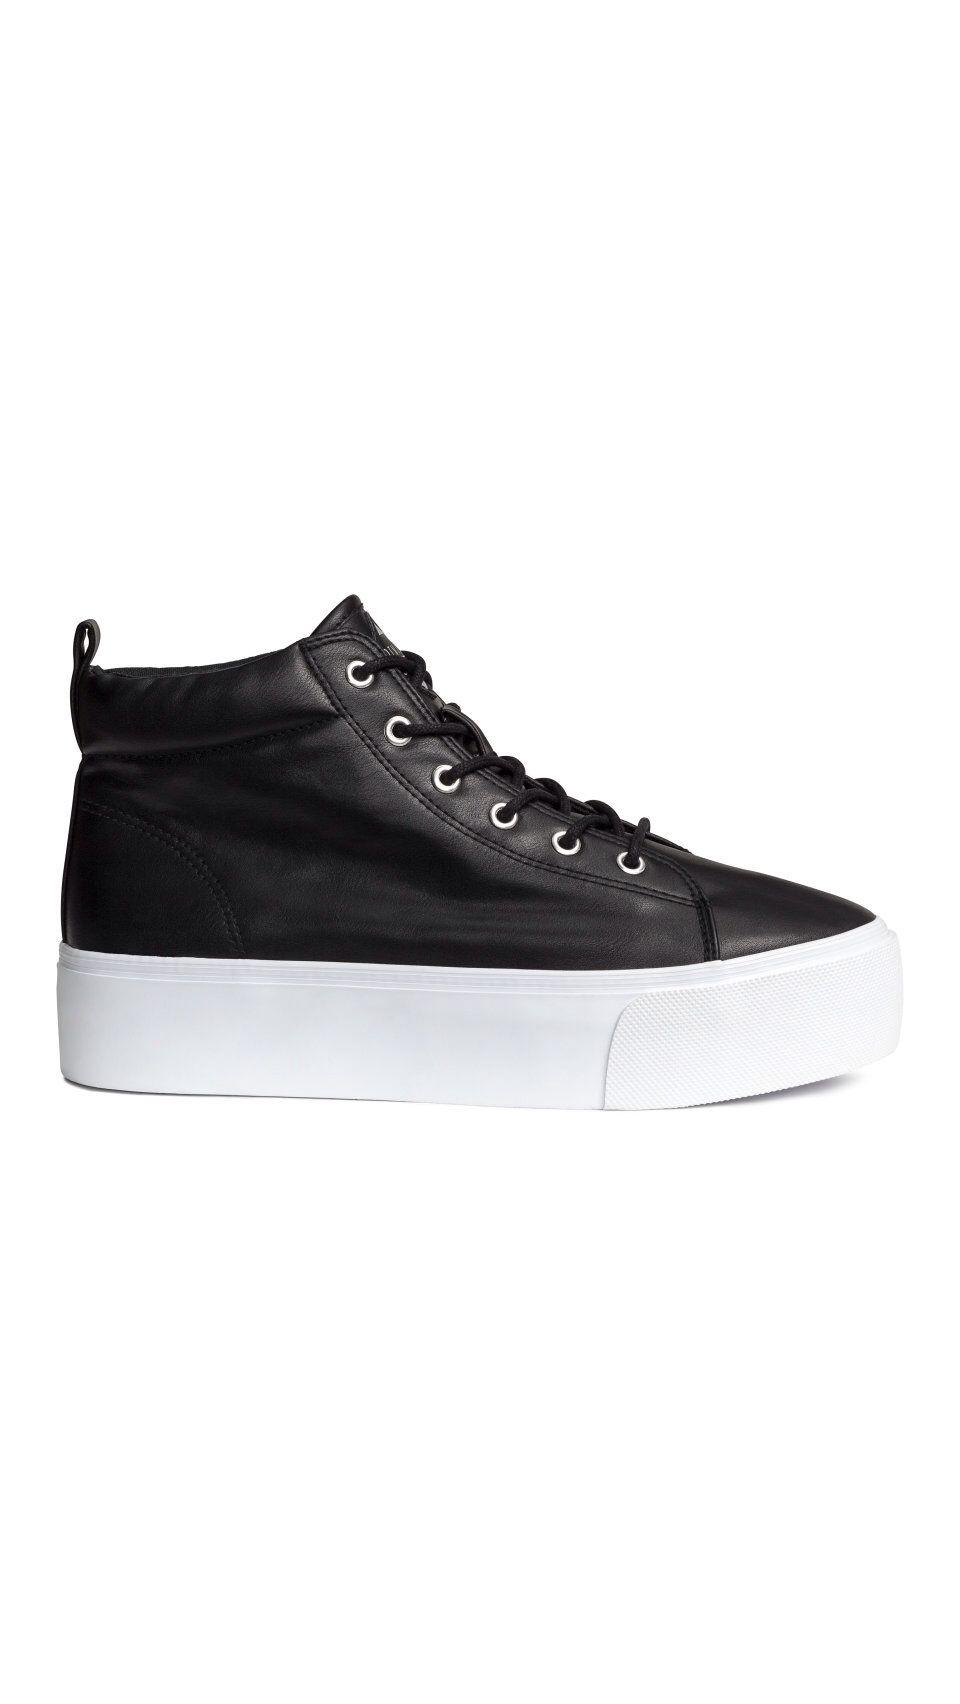 H\u0026m shoes, Sneakers, Shoes